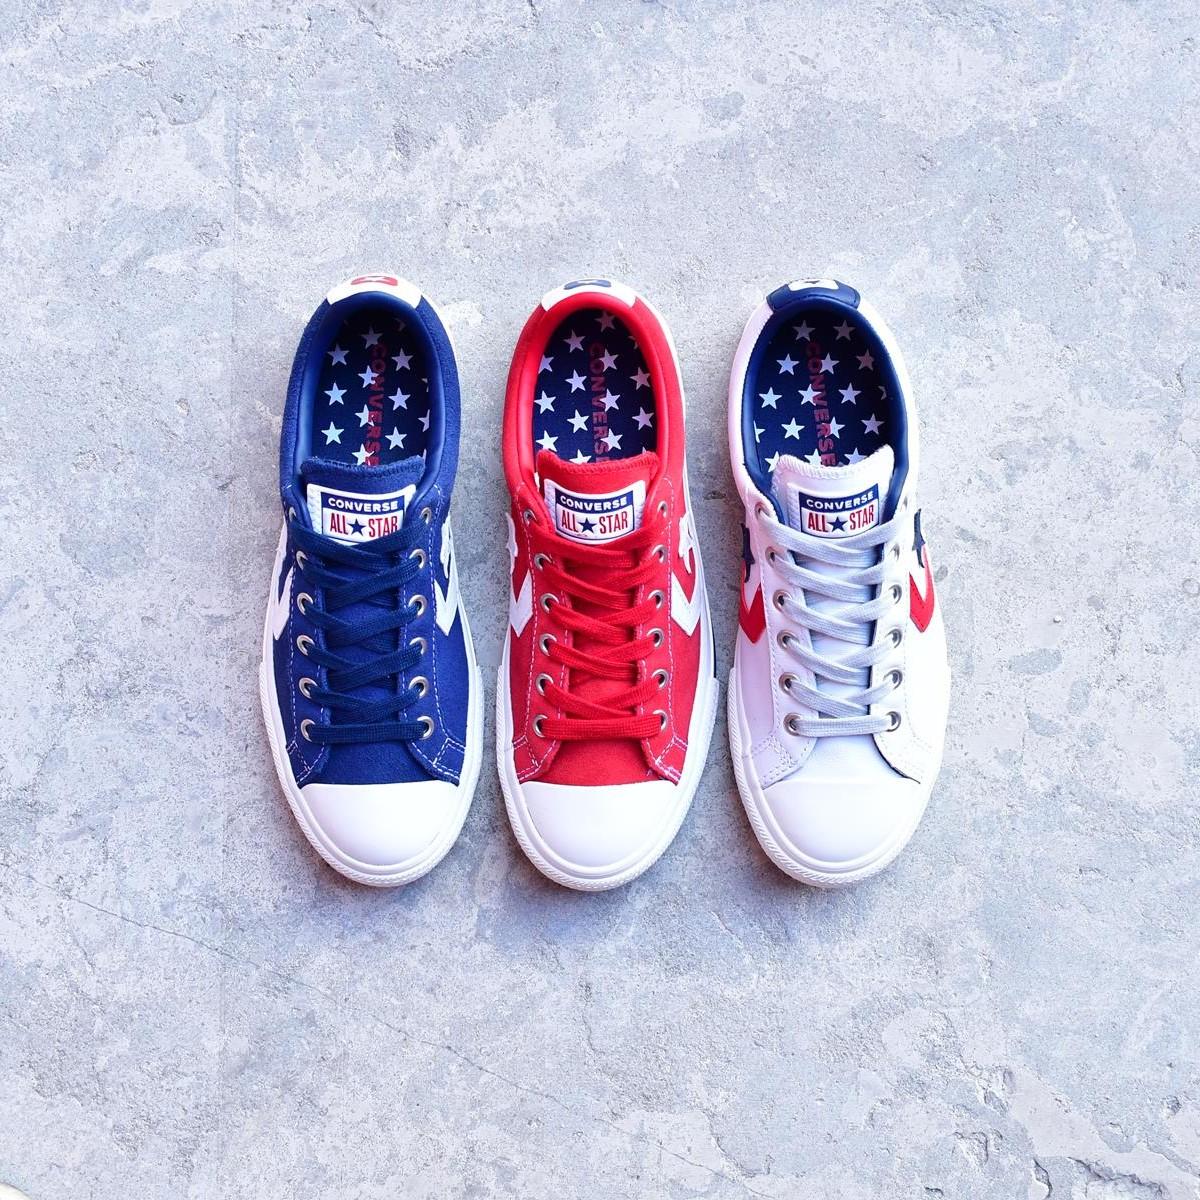 665872C_AmorShoes-Converse-Star-Player-Ev-Ox-suede-gym-red-white-laces-zapatilla-piel-vuelta-roja-cordones-puntera-goma-65872C-HOME-2